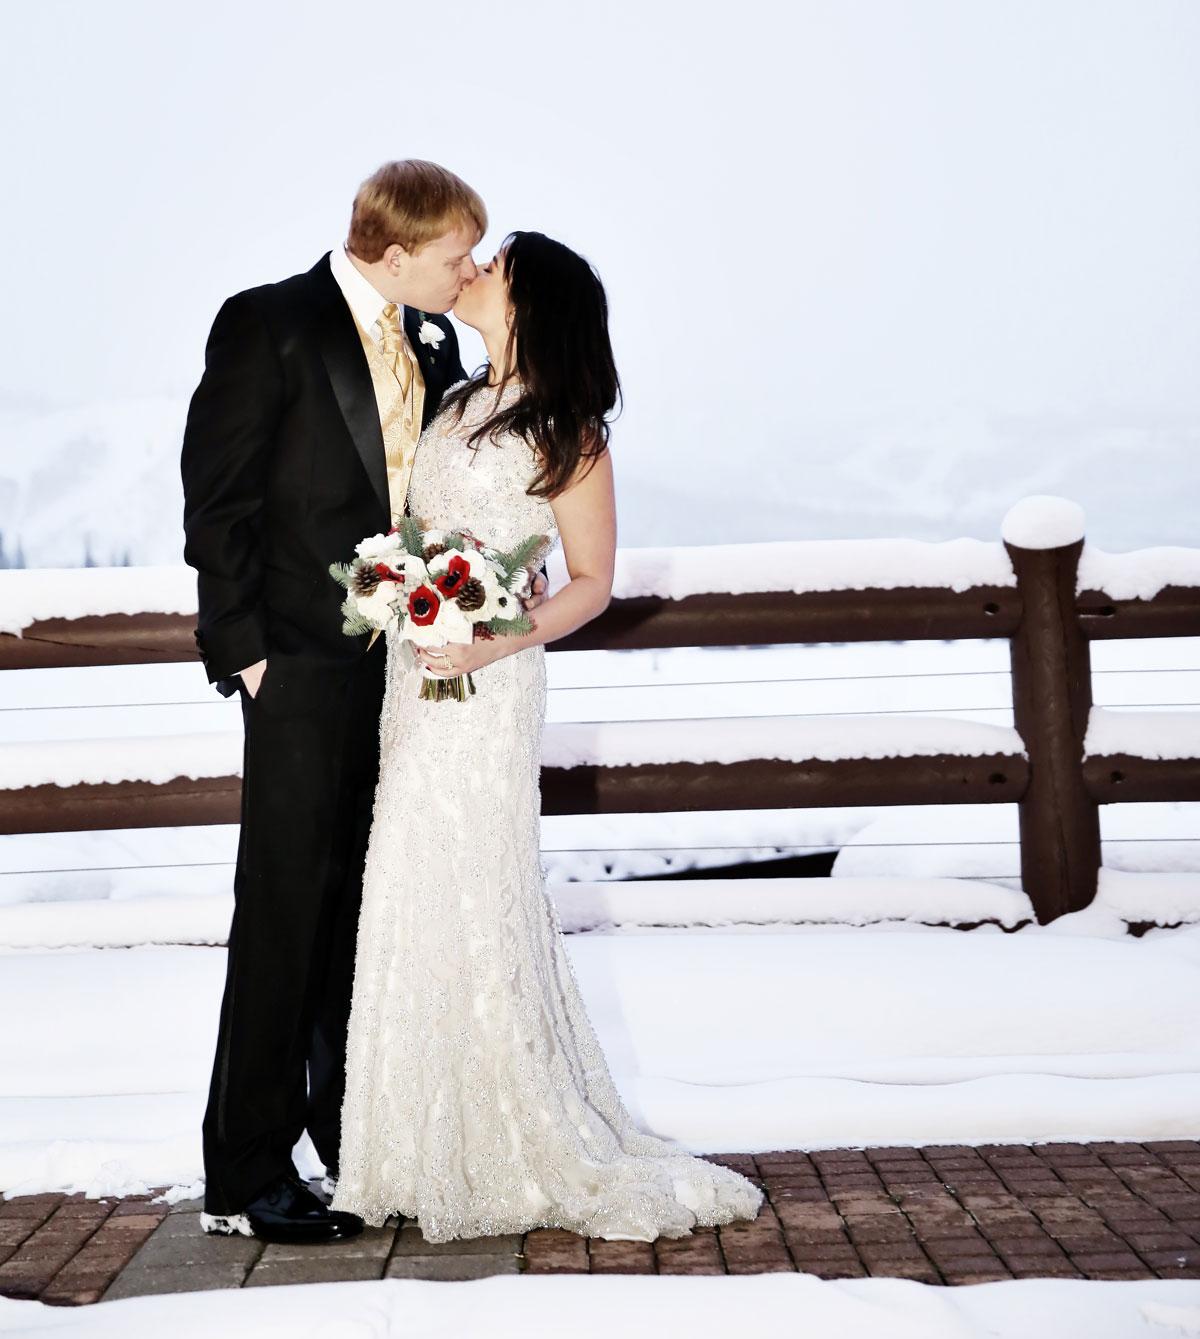 A snowy Christmas wedding in Utah